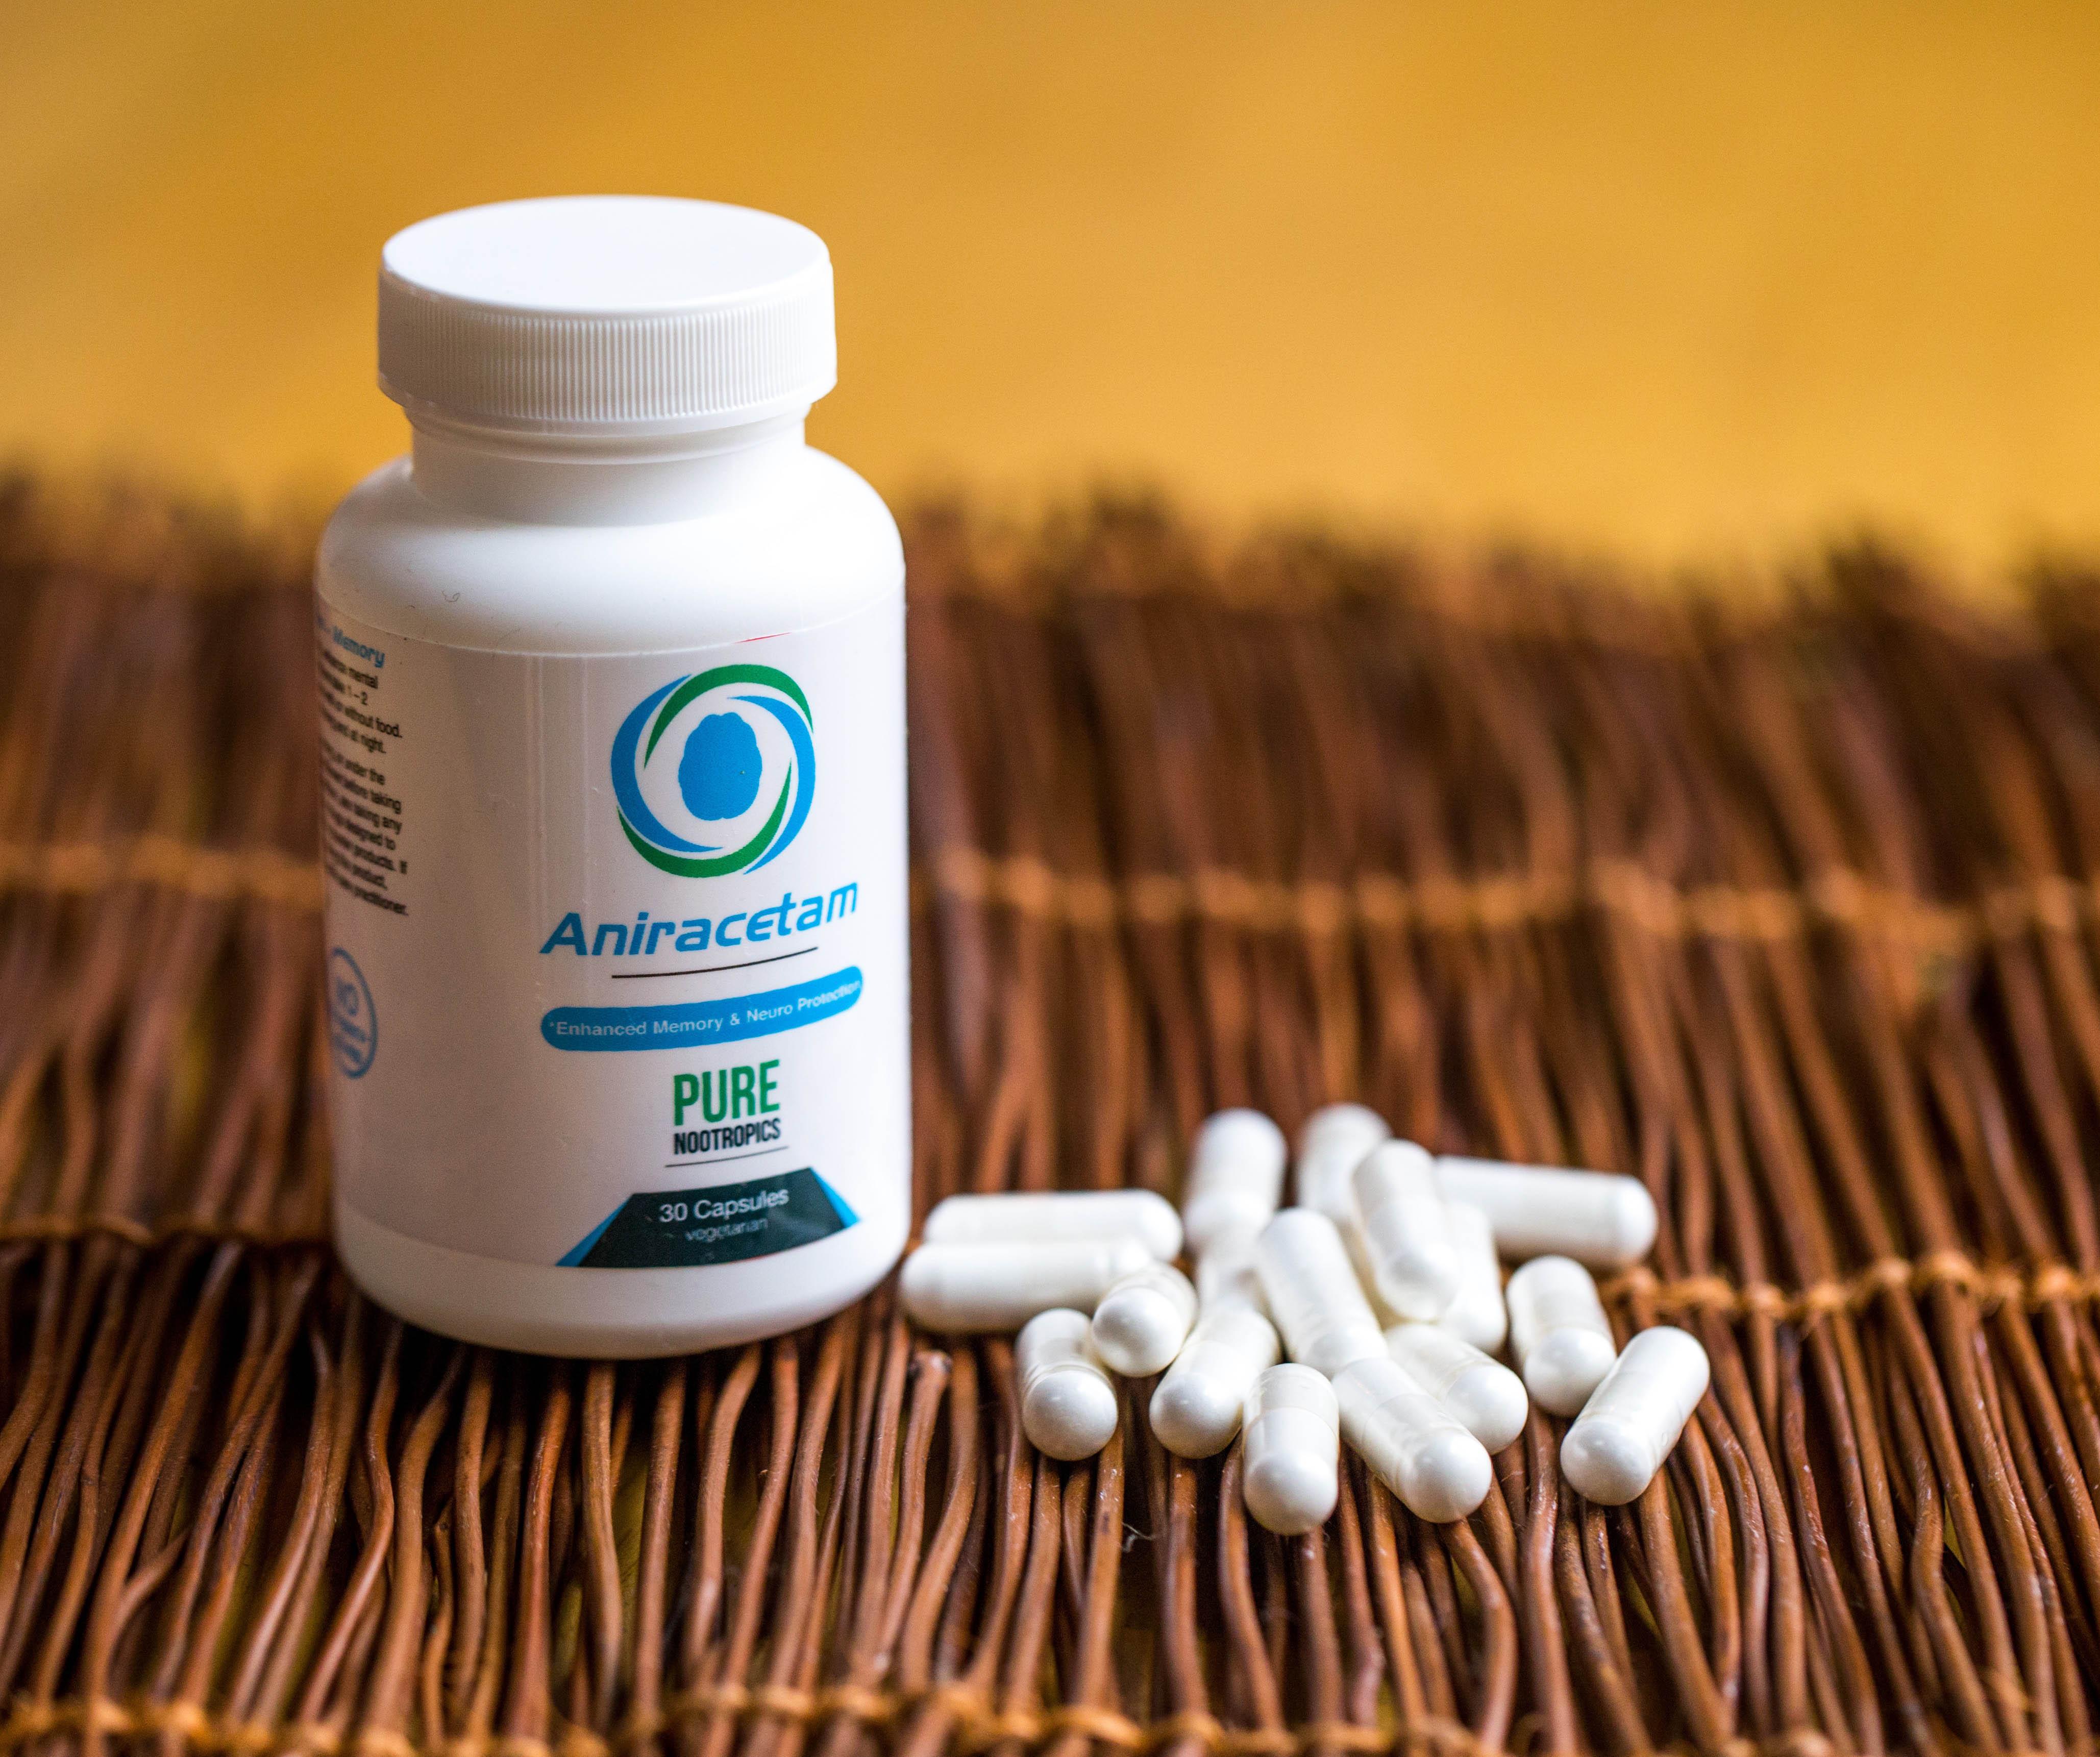 Aniracetam Benefits